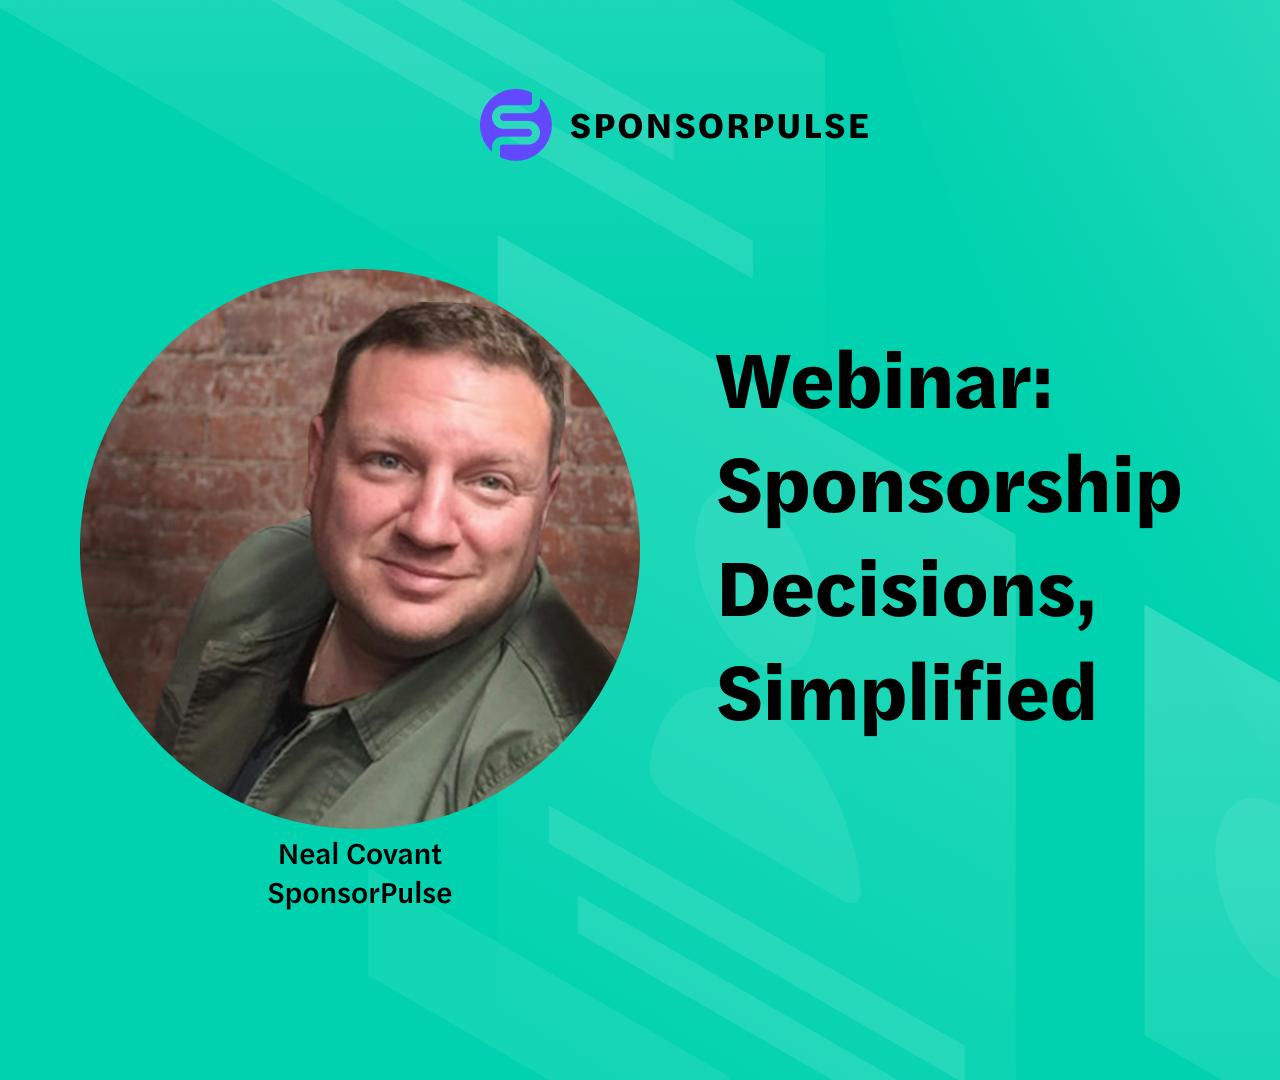 SponsorPulse Webinar: Sponsorship Decisions, Simplified